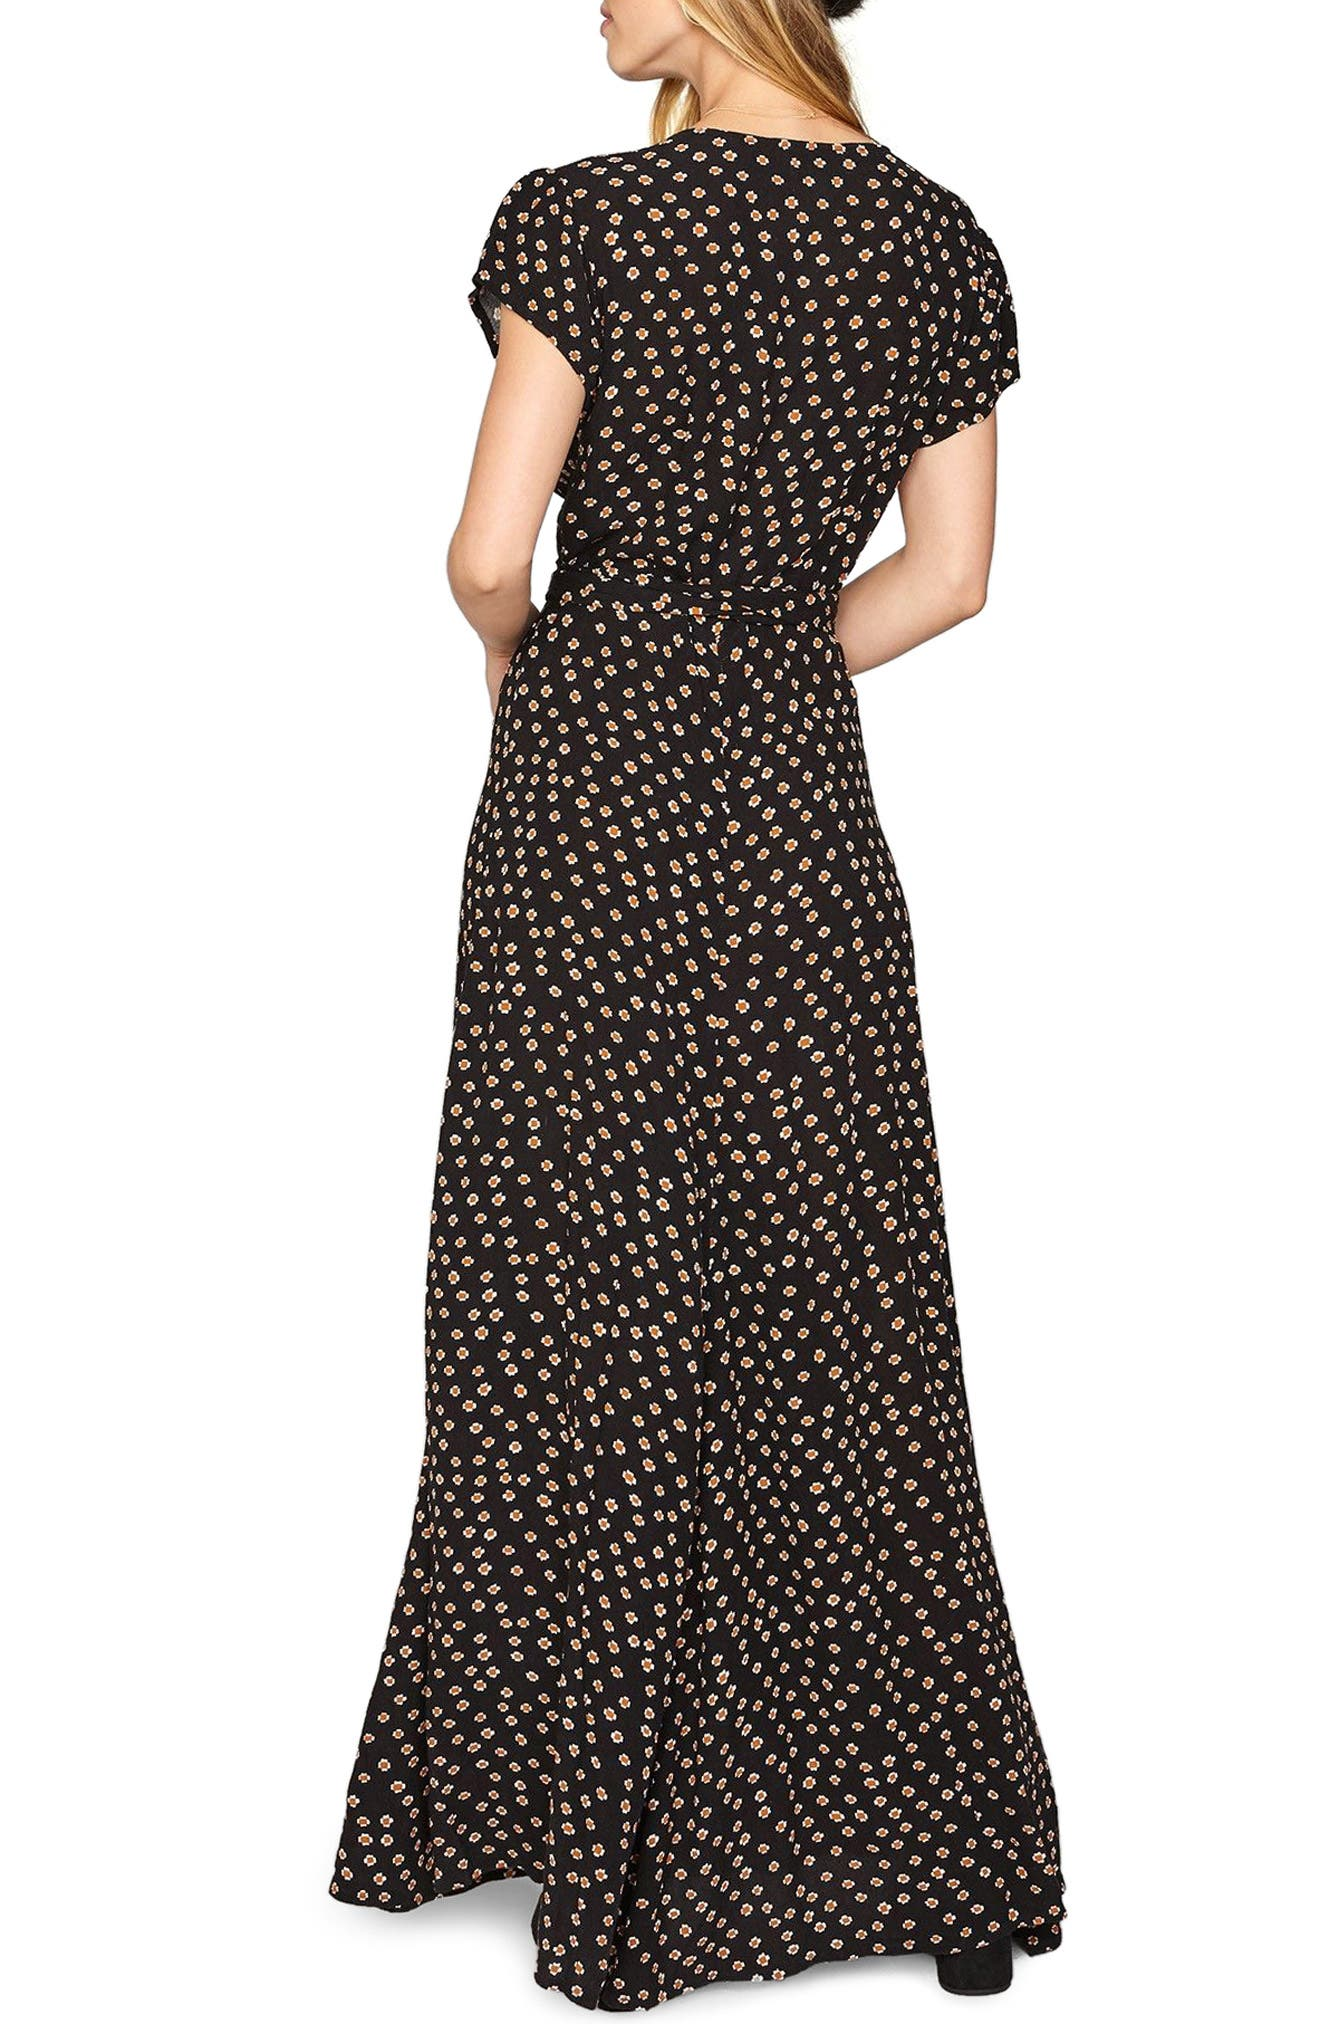 Beachscape Maxi Wrap Dress,                             Alternate thumbnail 2, color,                             001